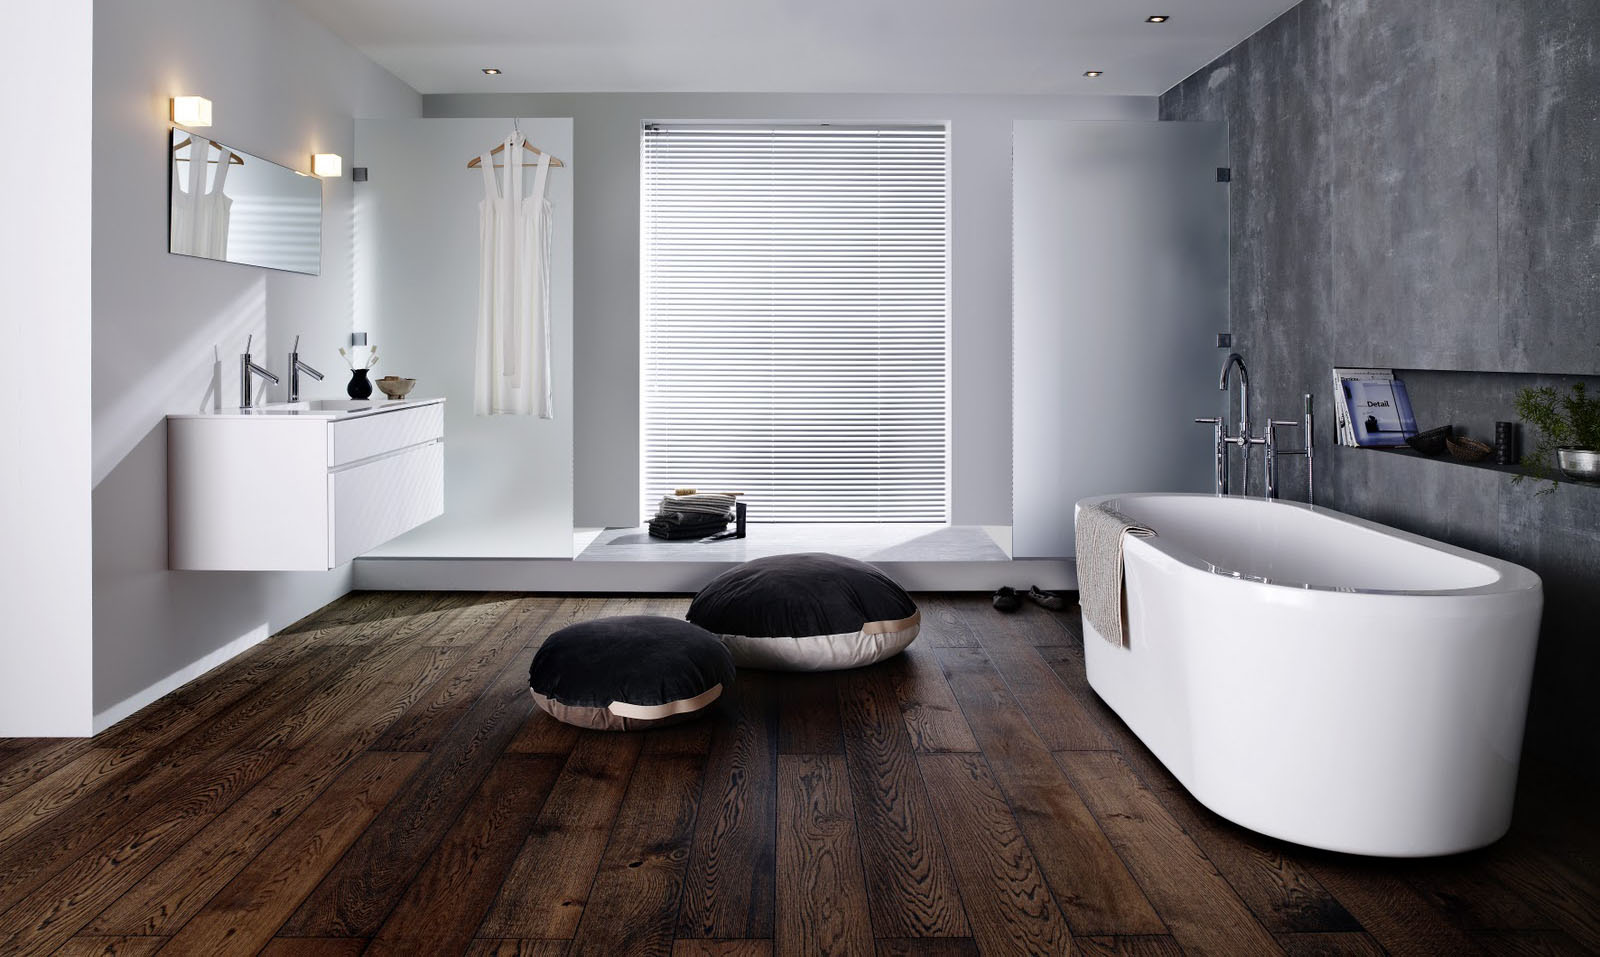 farkli-orjinal-Banyo-Dekorasyon-Modelleri